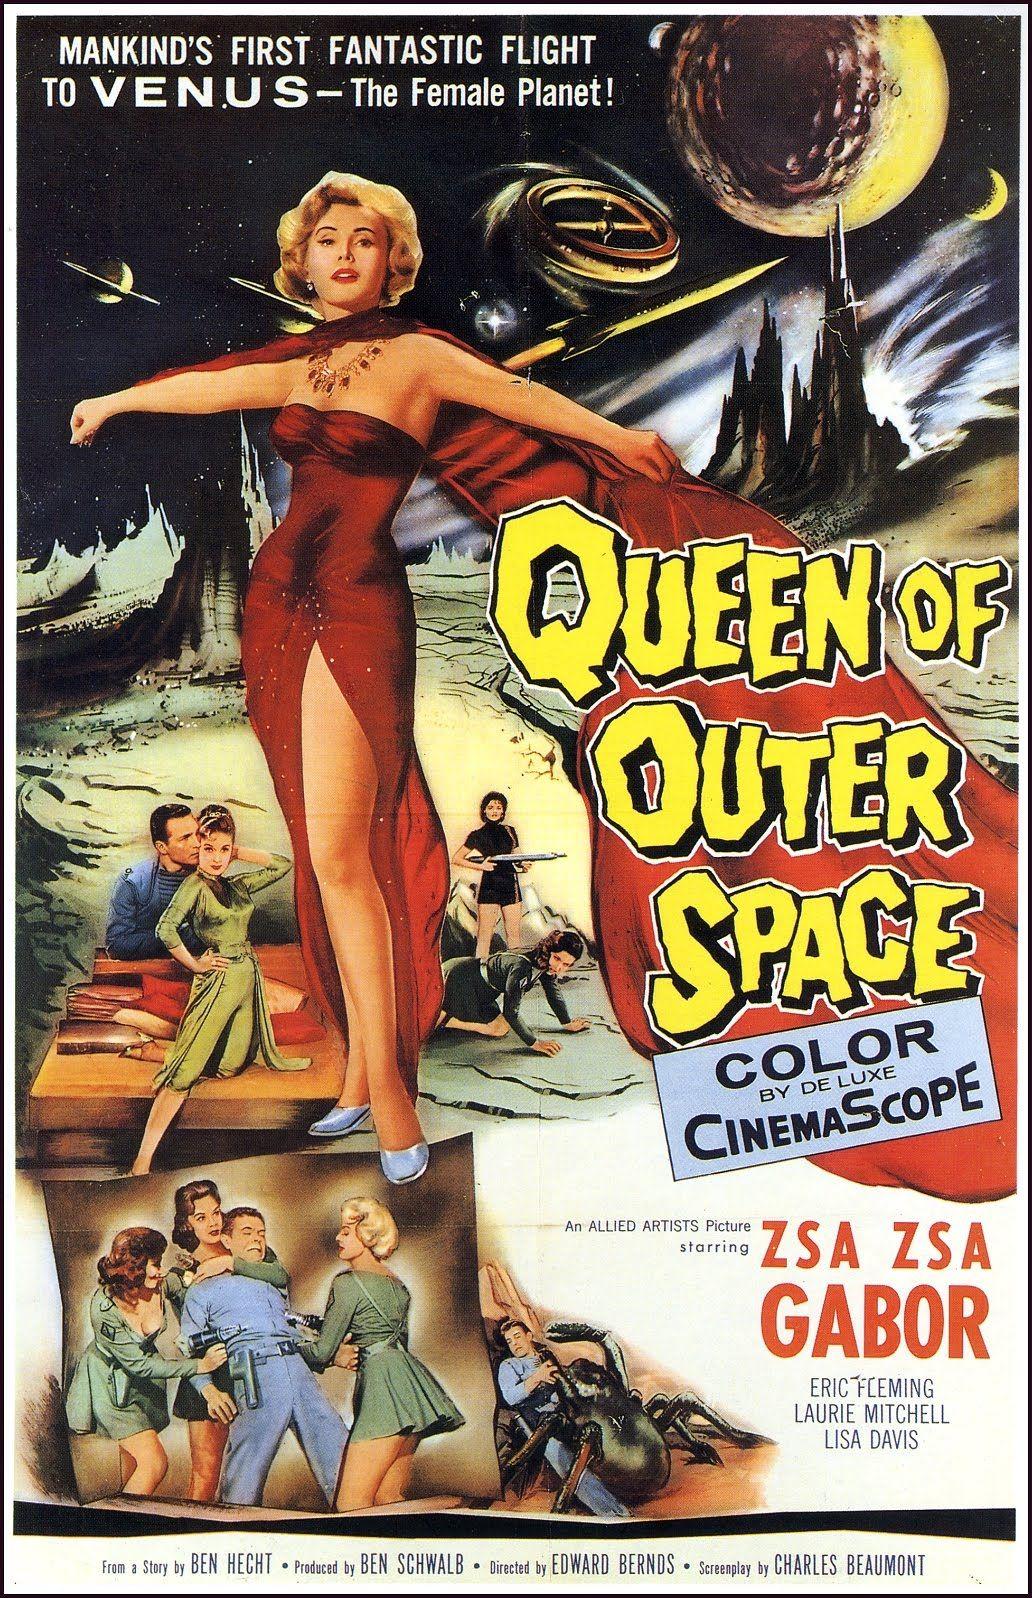 Bad Cinema Vintage Sexploitation Film Posters Space Movies